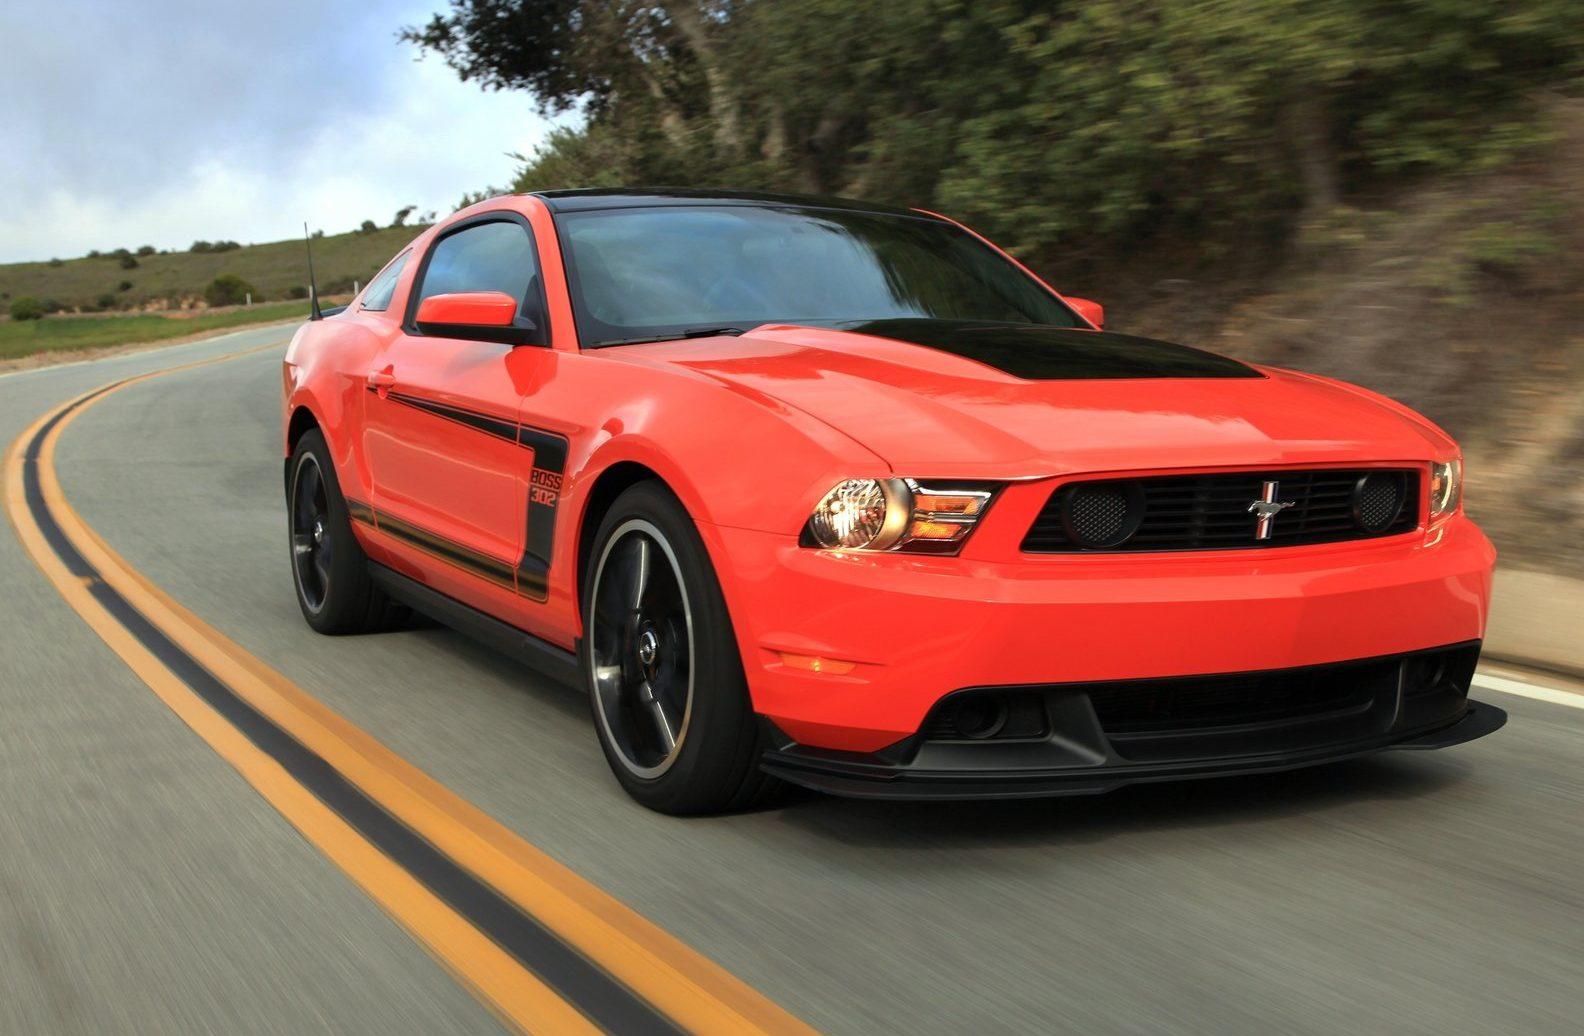 Red 2012 Mustang Boss 302